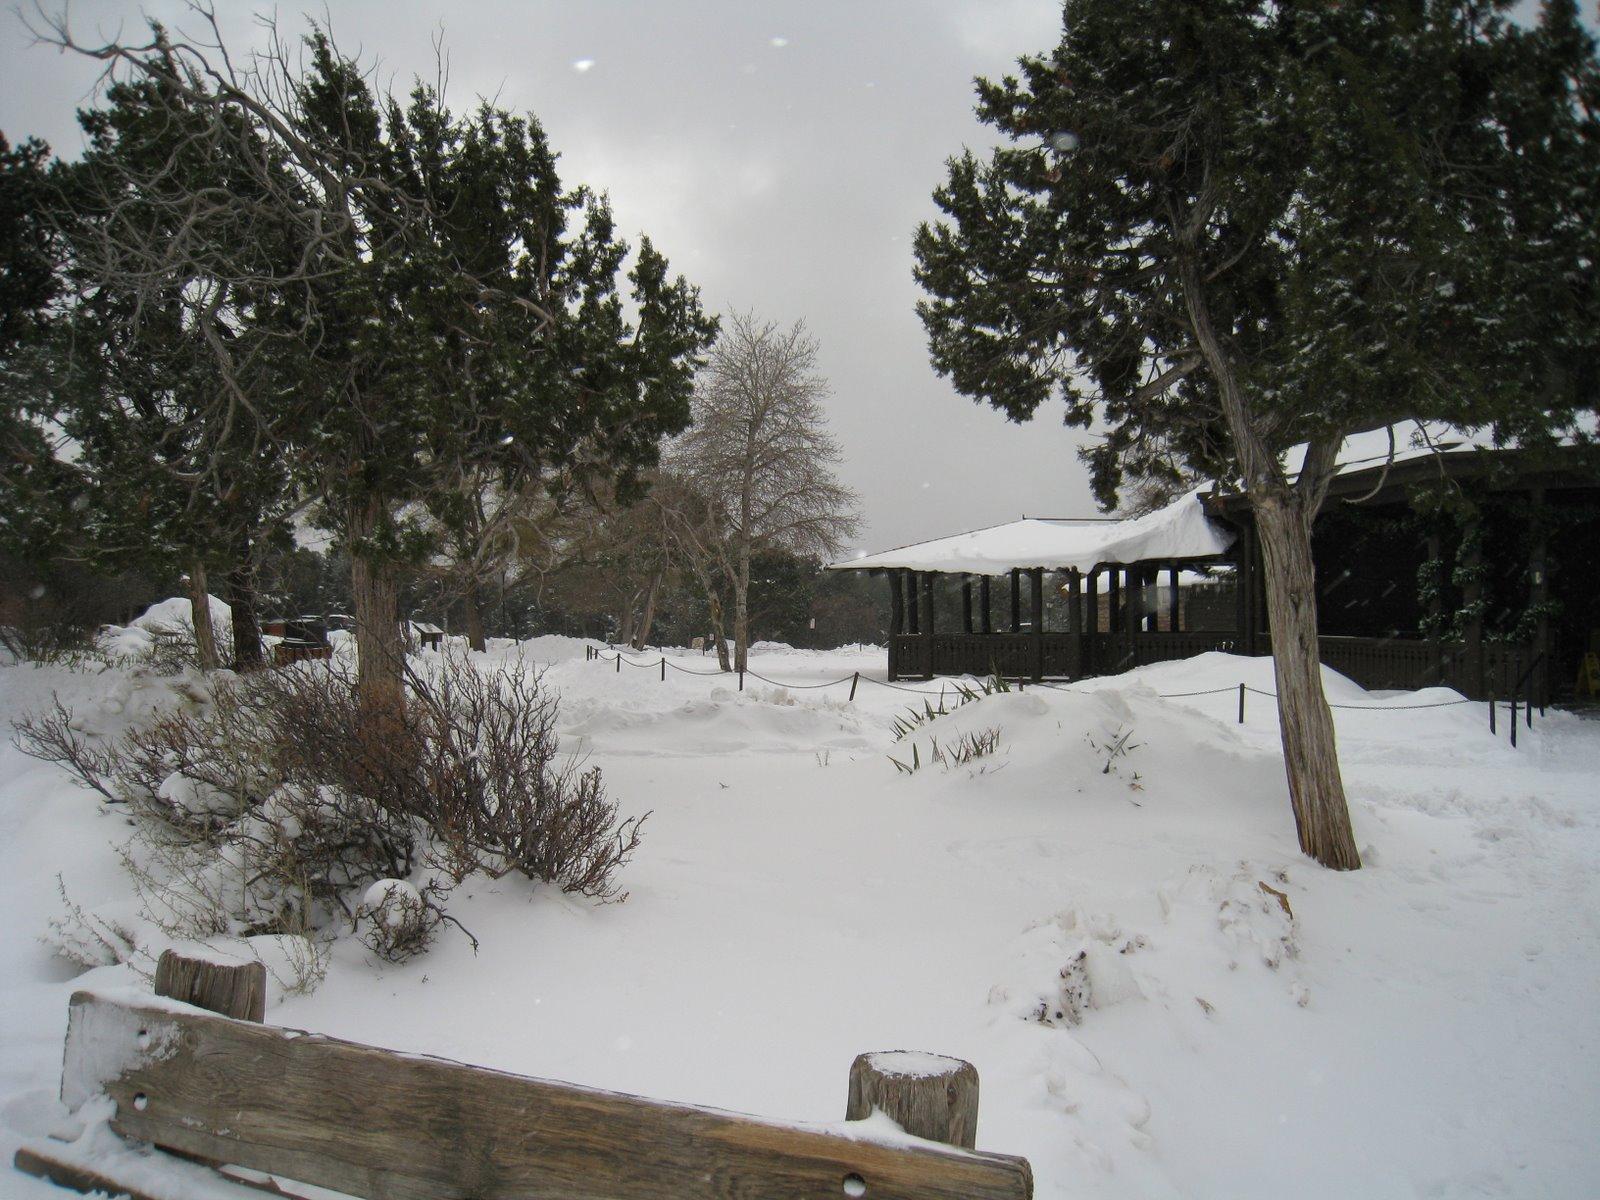 The El Tovar Lodge